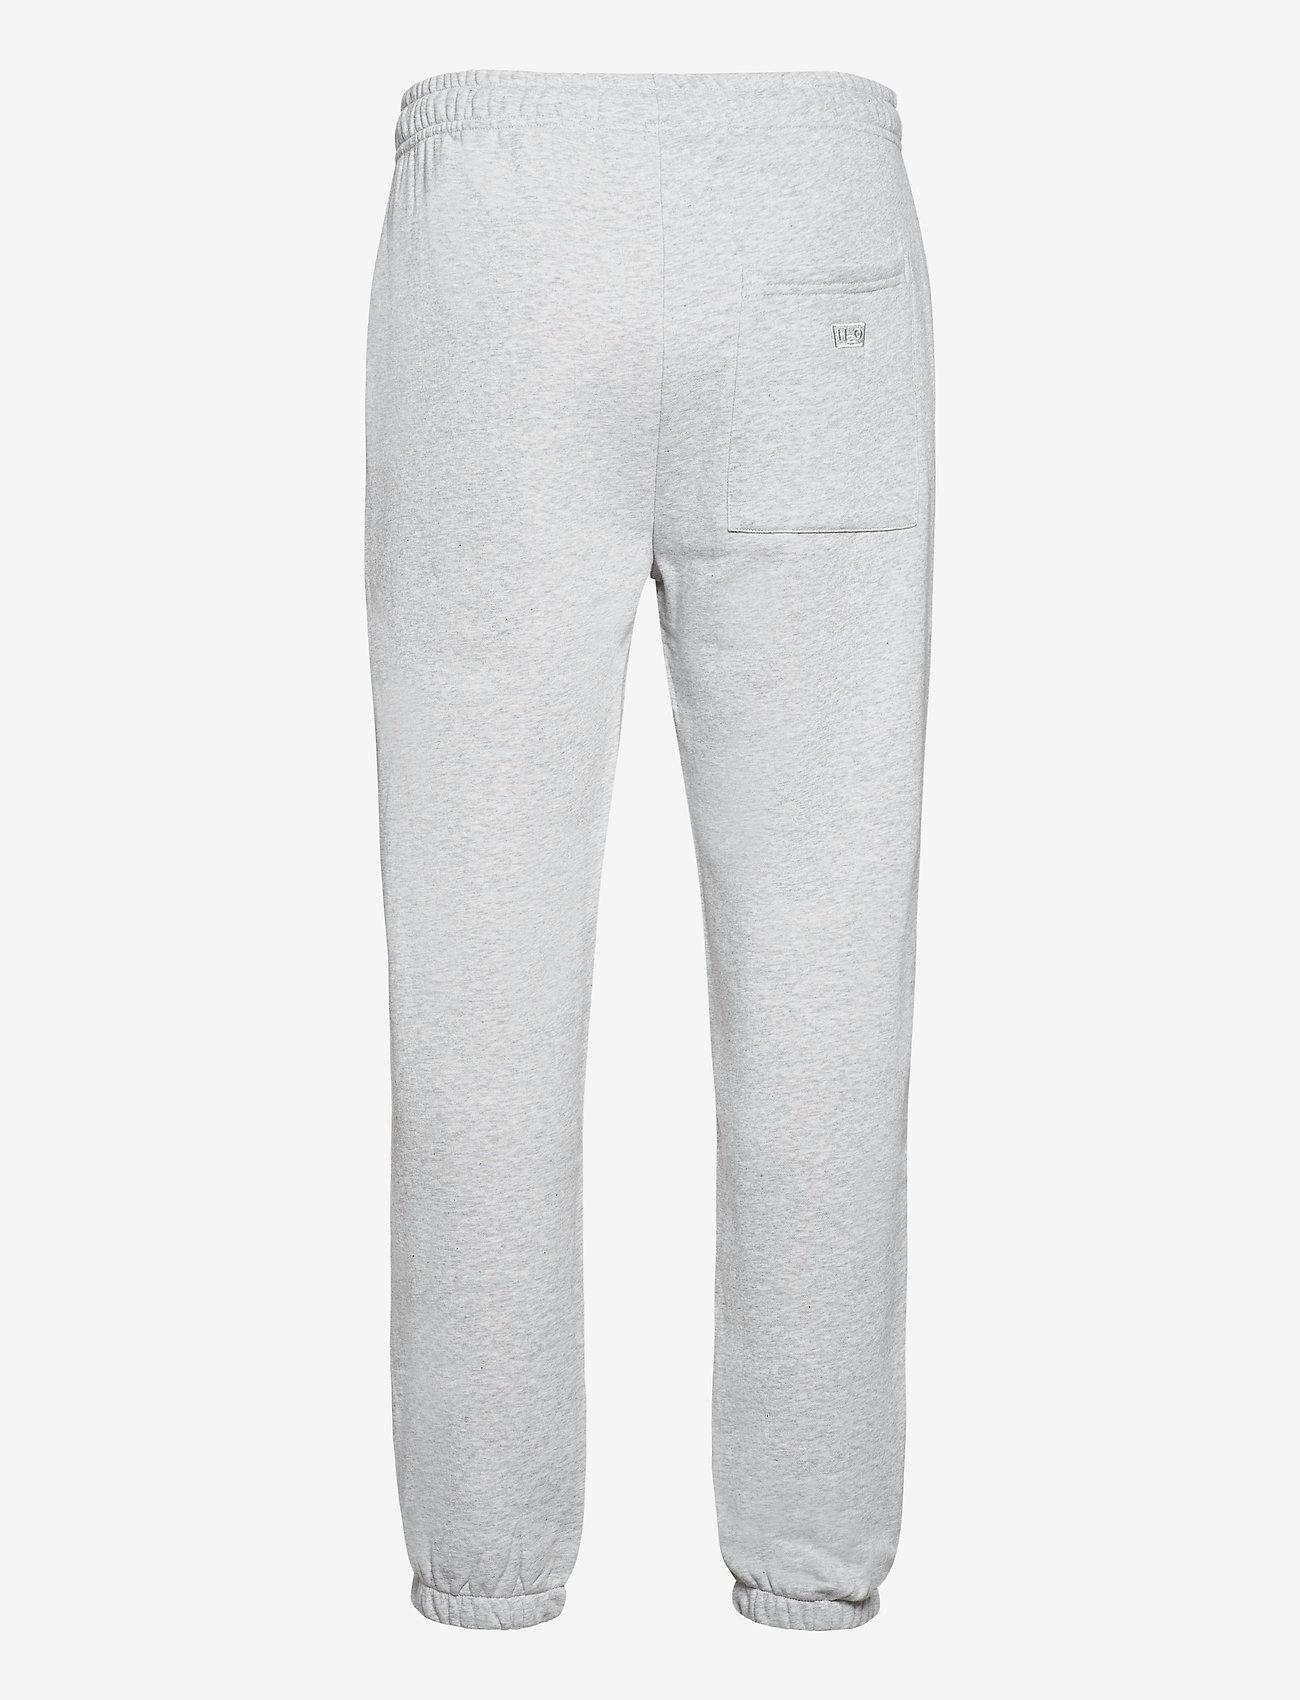 H2O - Couch Sweat Pants - tøj - lt. grey mel - 1